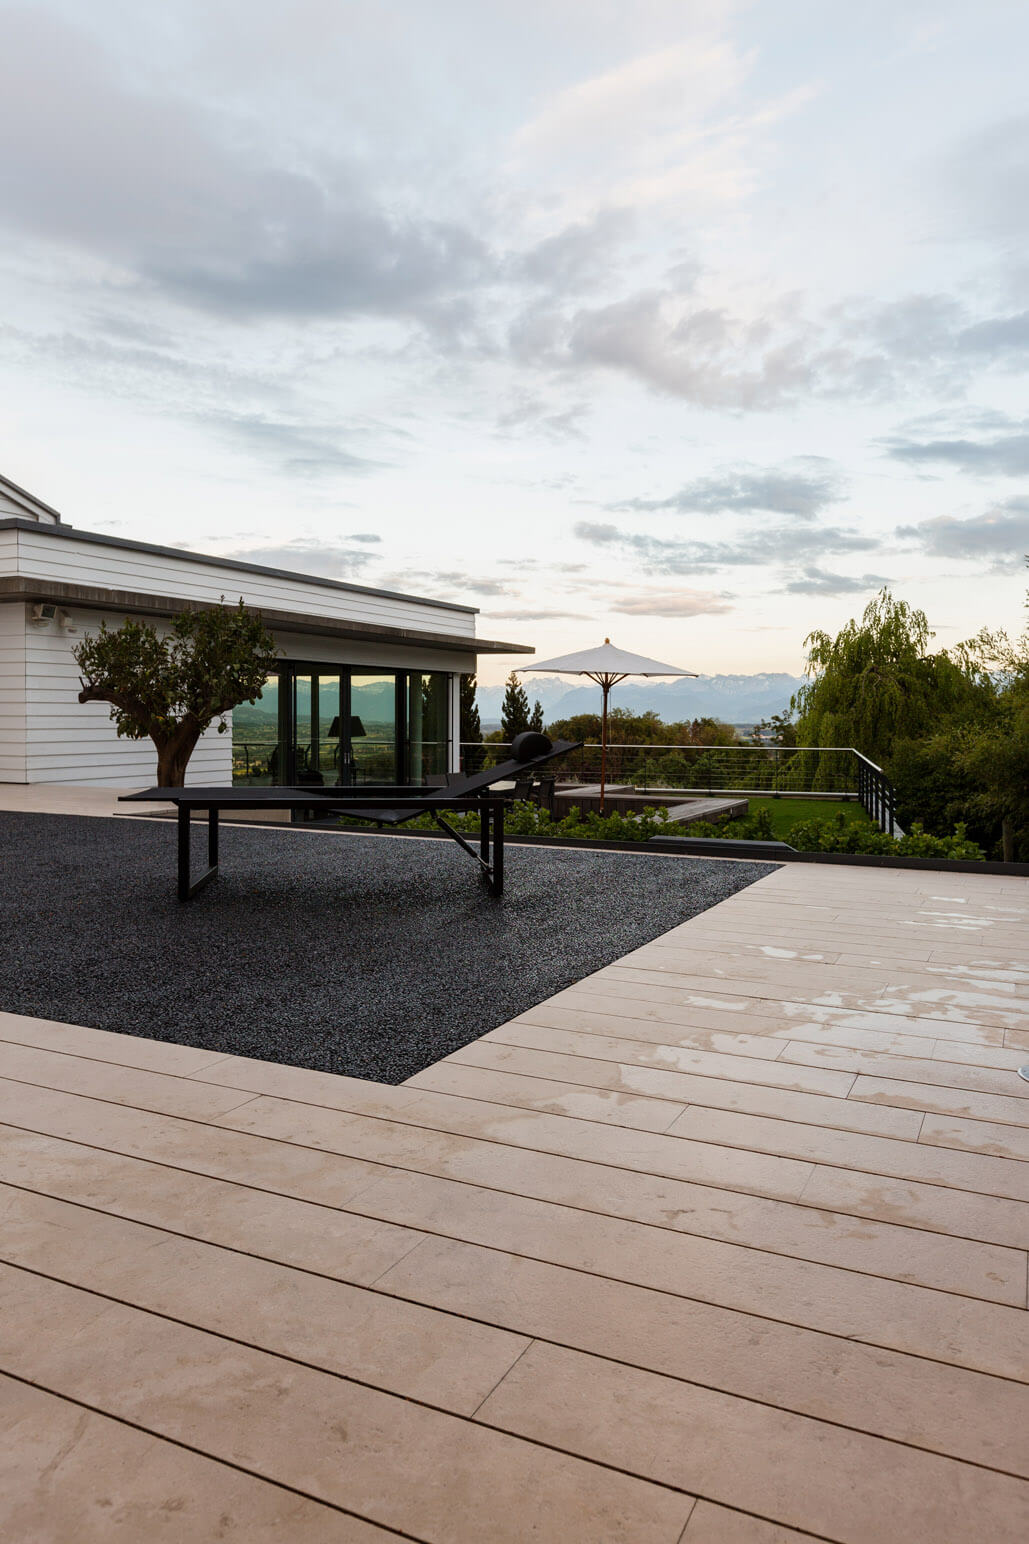 terrassenbelag in outdoor wellnessanlage mit pool. Black Bedroom Furniture Sets. Home Design Ideas